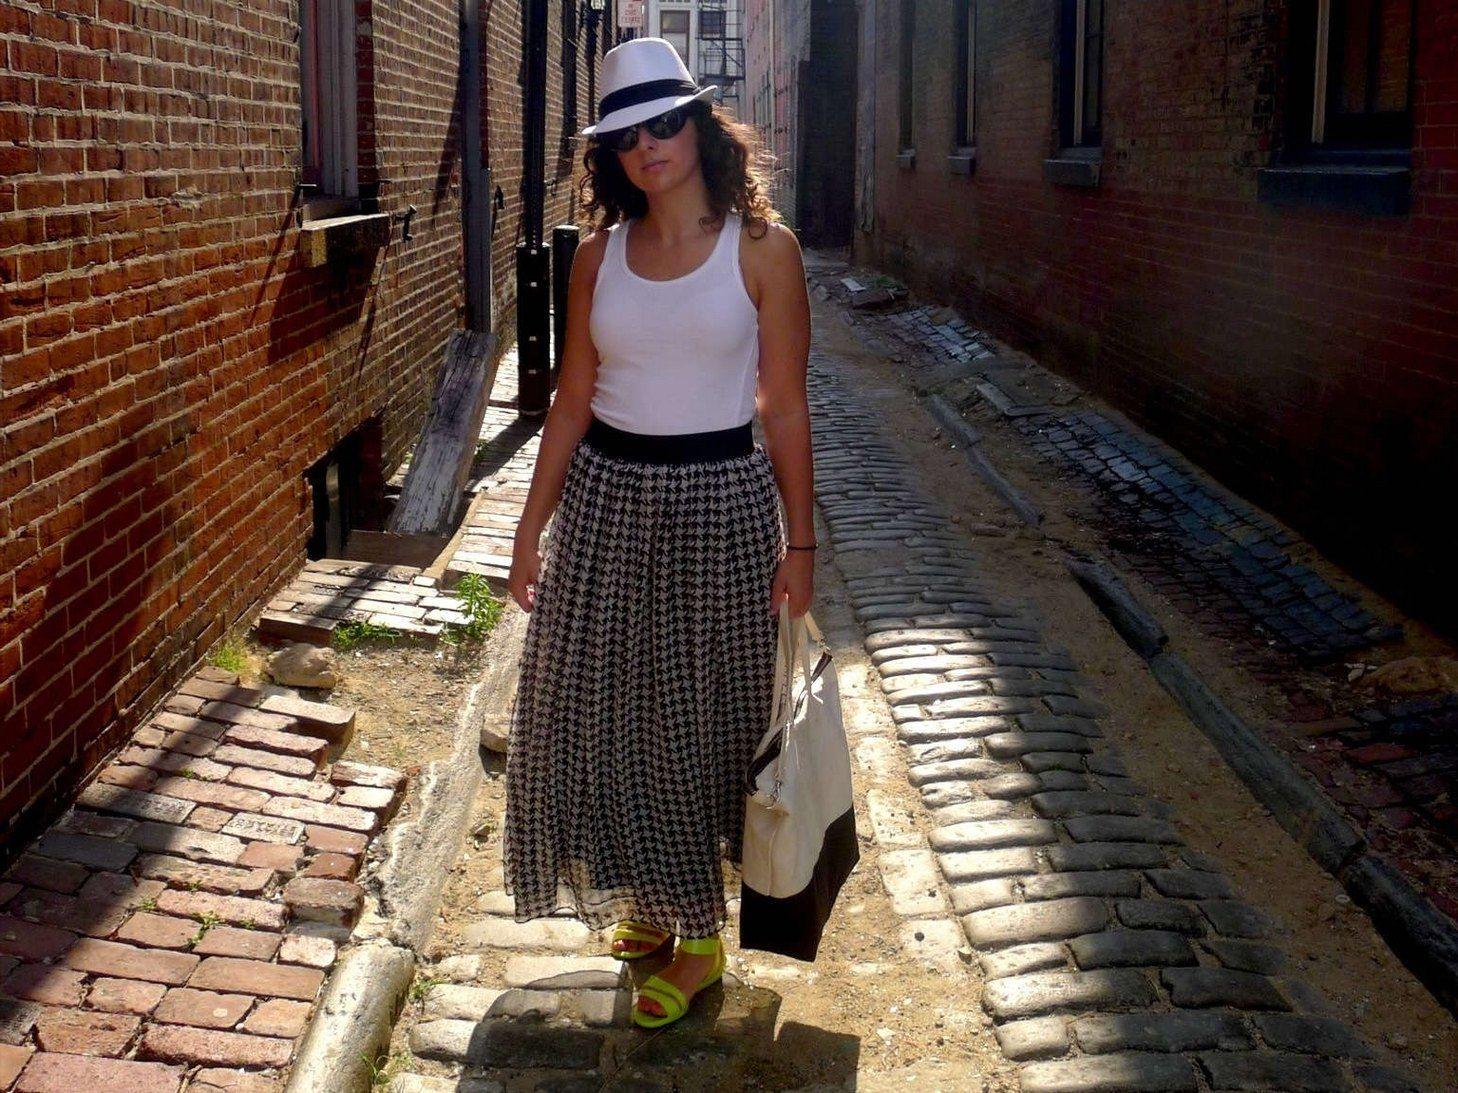 Grey Felt Hat Outfits  Casual Fashion White Cotton Black -6637